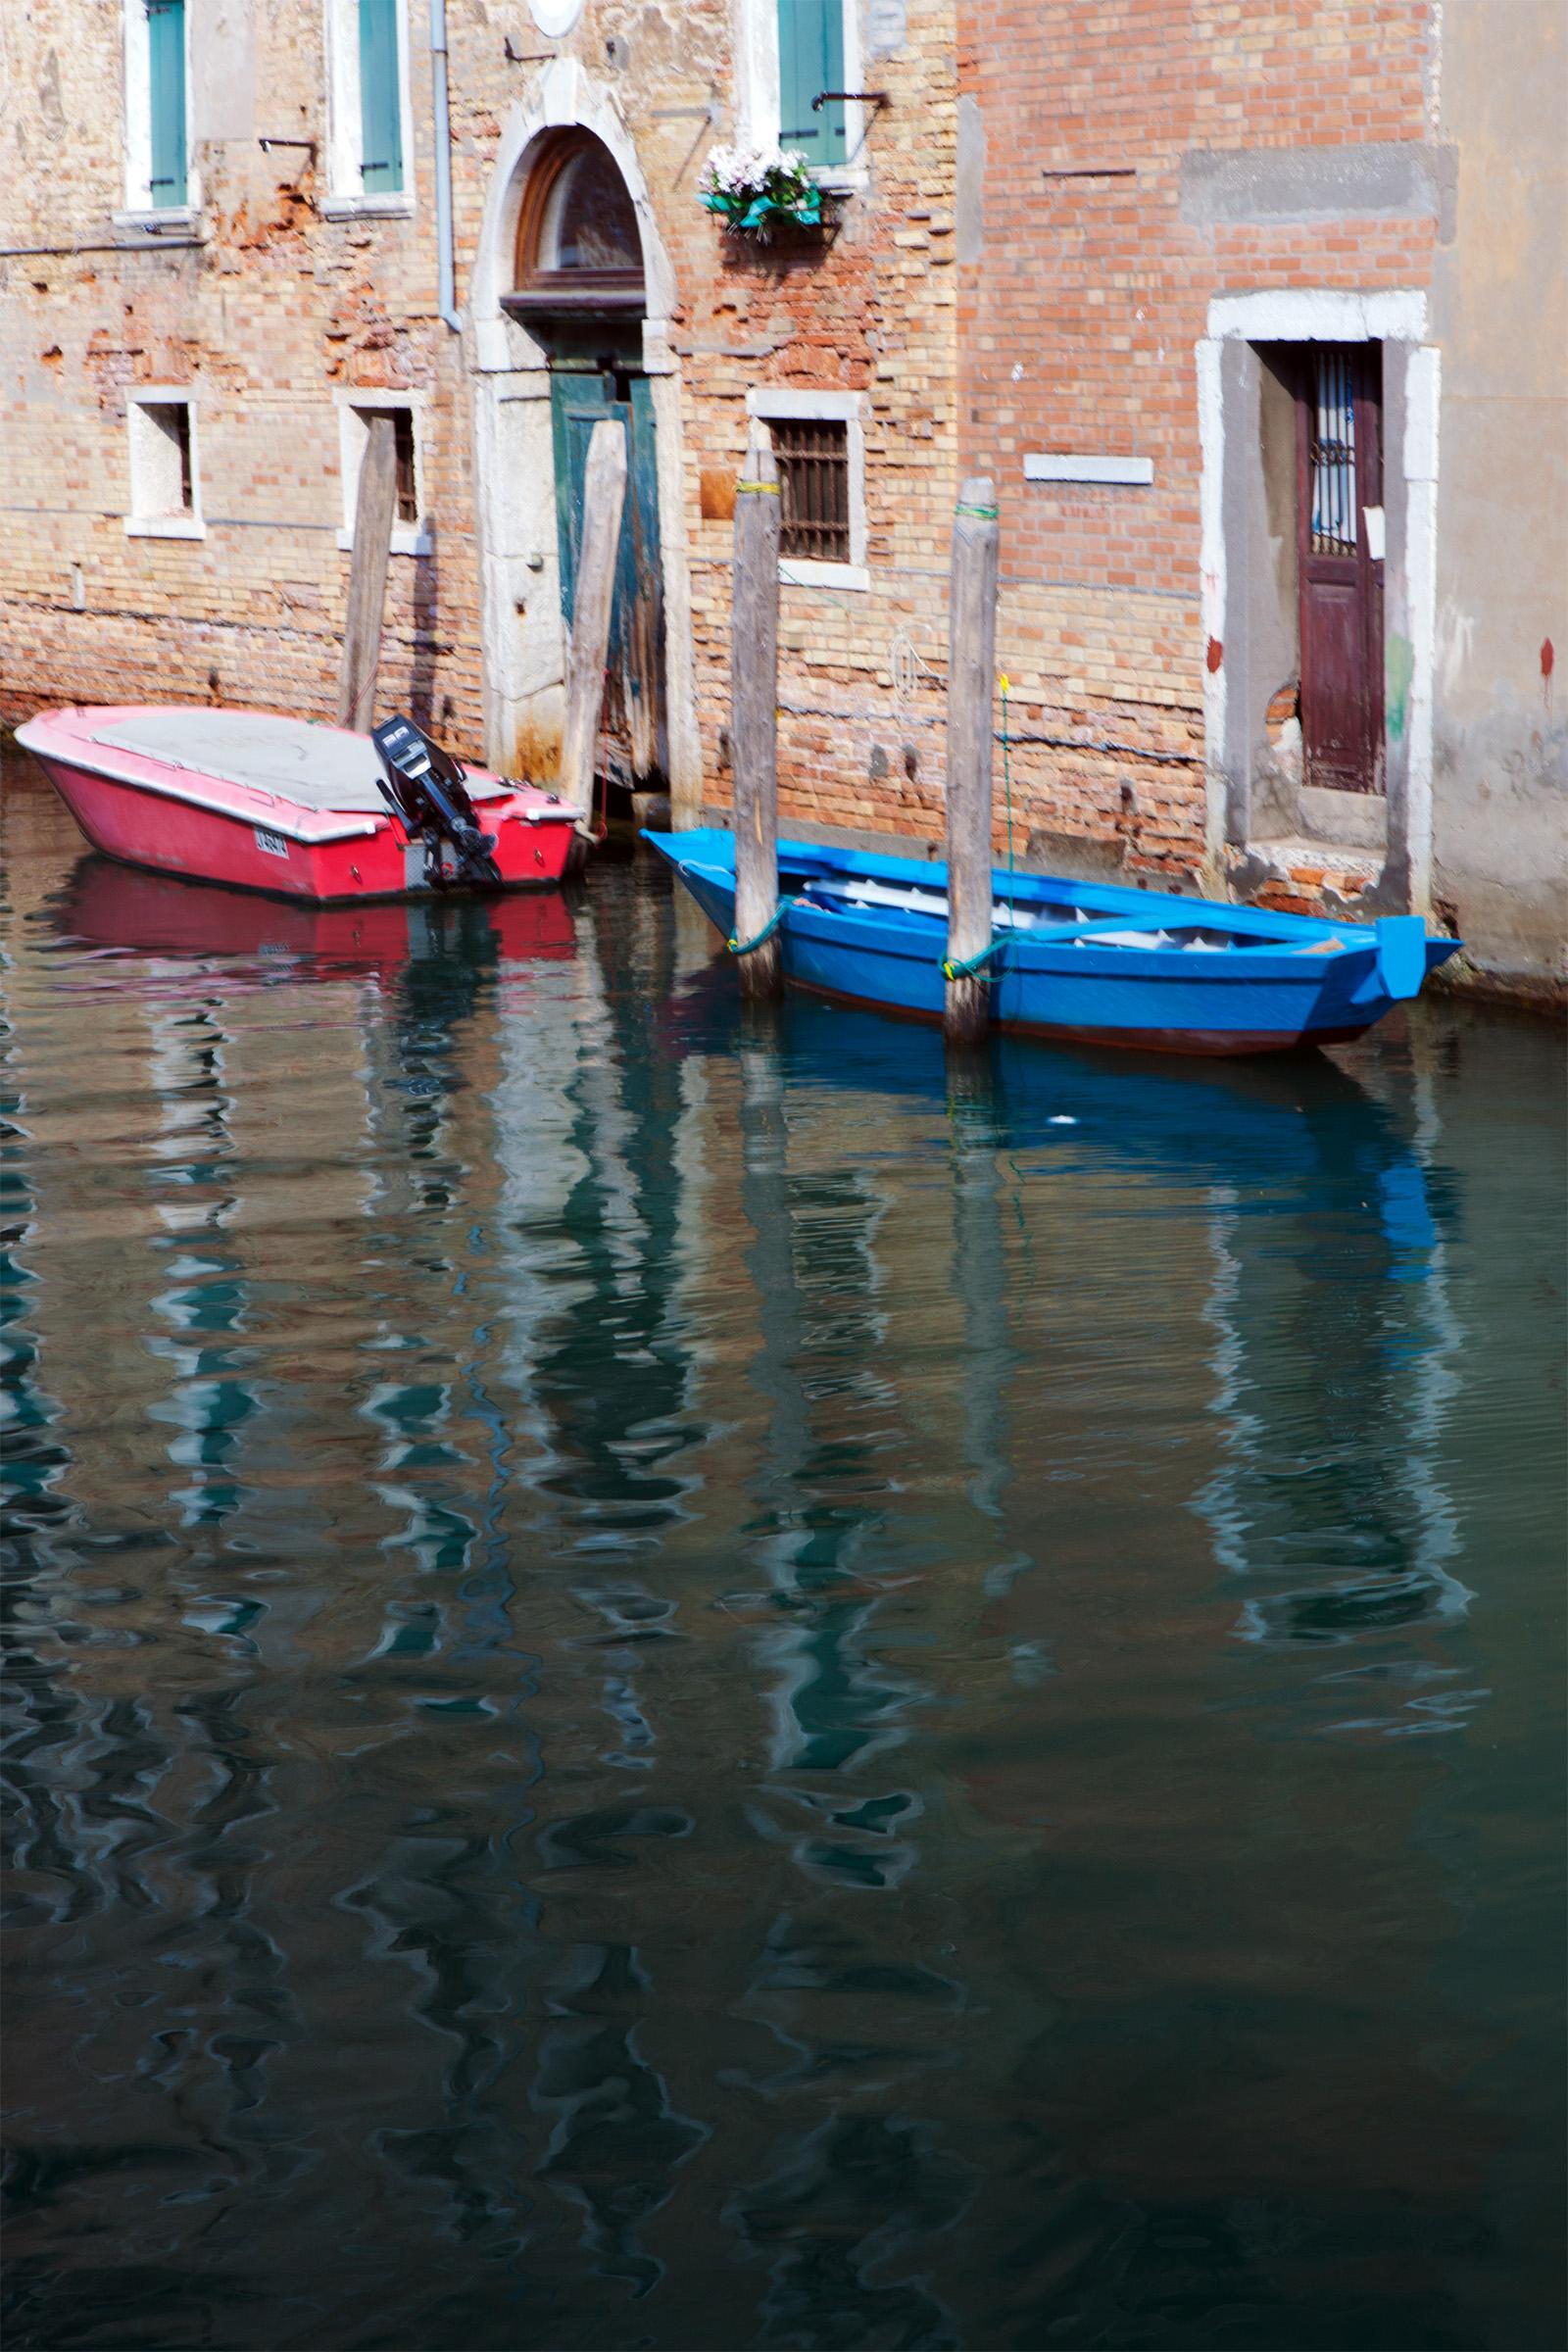 Venice photo